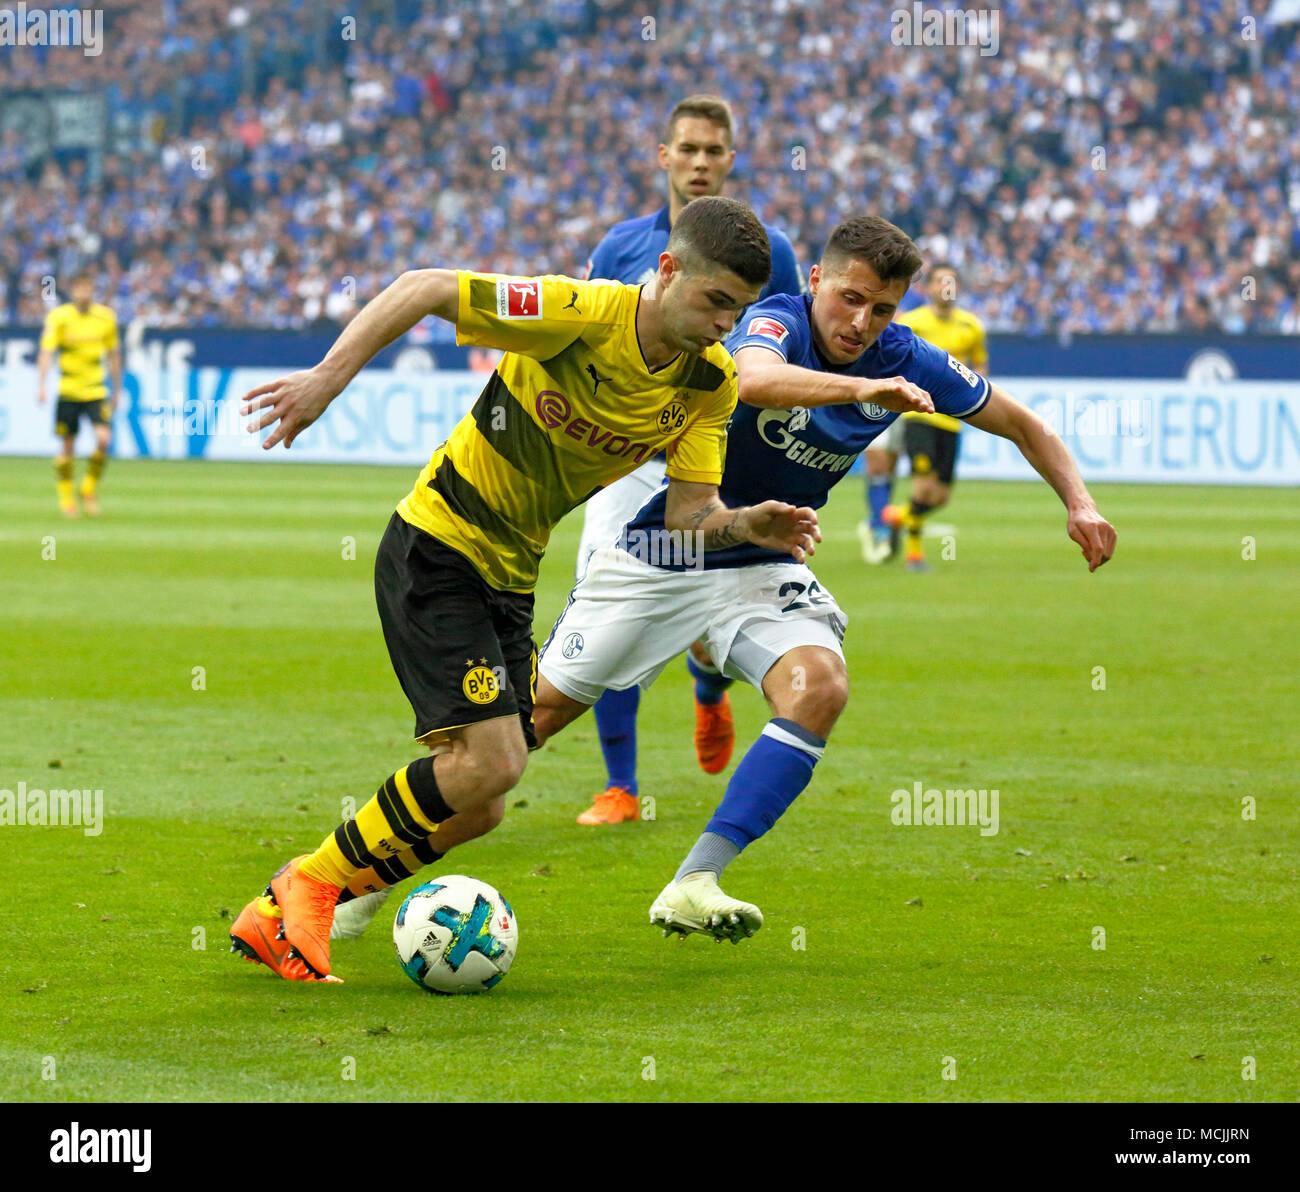 sports, football, Bundesliga, 2017/2018, FC Schalke 04 vs BVB Borussia Dortmund 2:0, Veltins Arena Gelsenkirchen, scene of the match, Christian Pulisic (BVB) left and Alessandro Schoepf (S04), behind Marko Pjaca (S04) - Stock Image